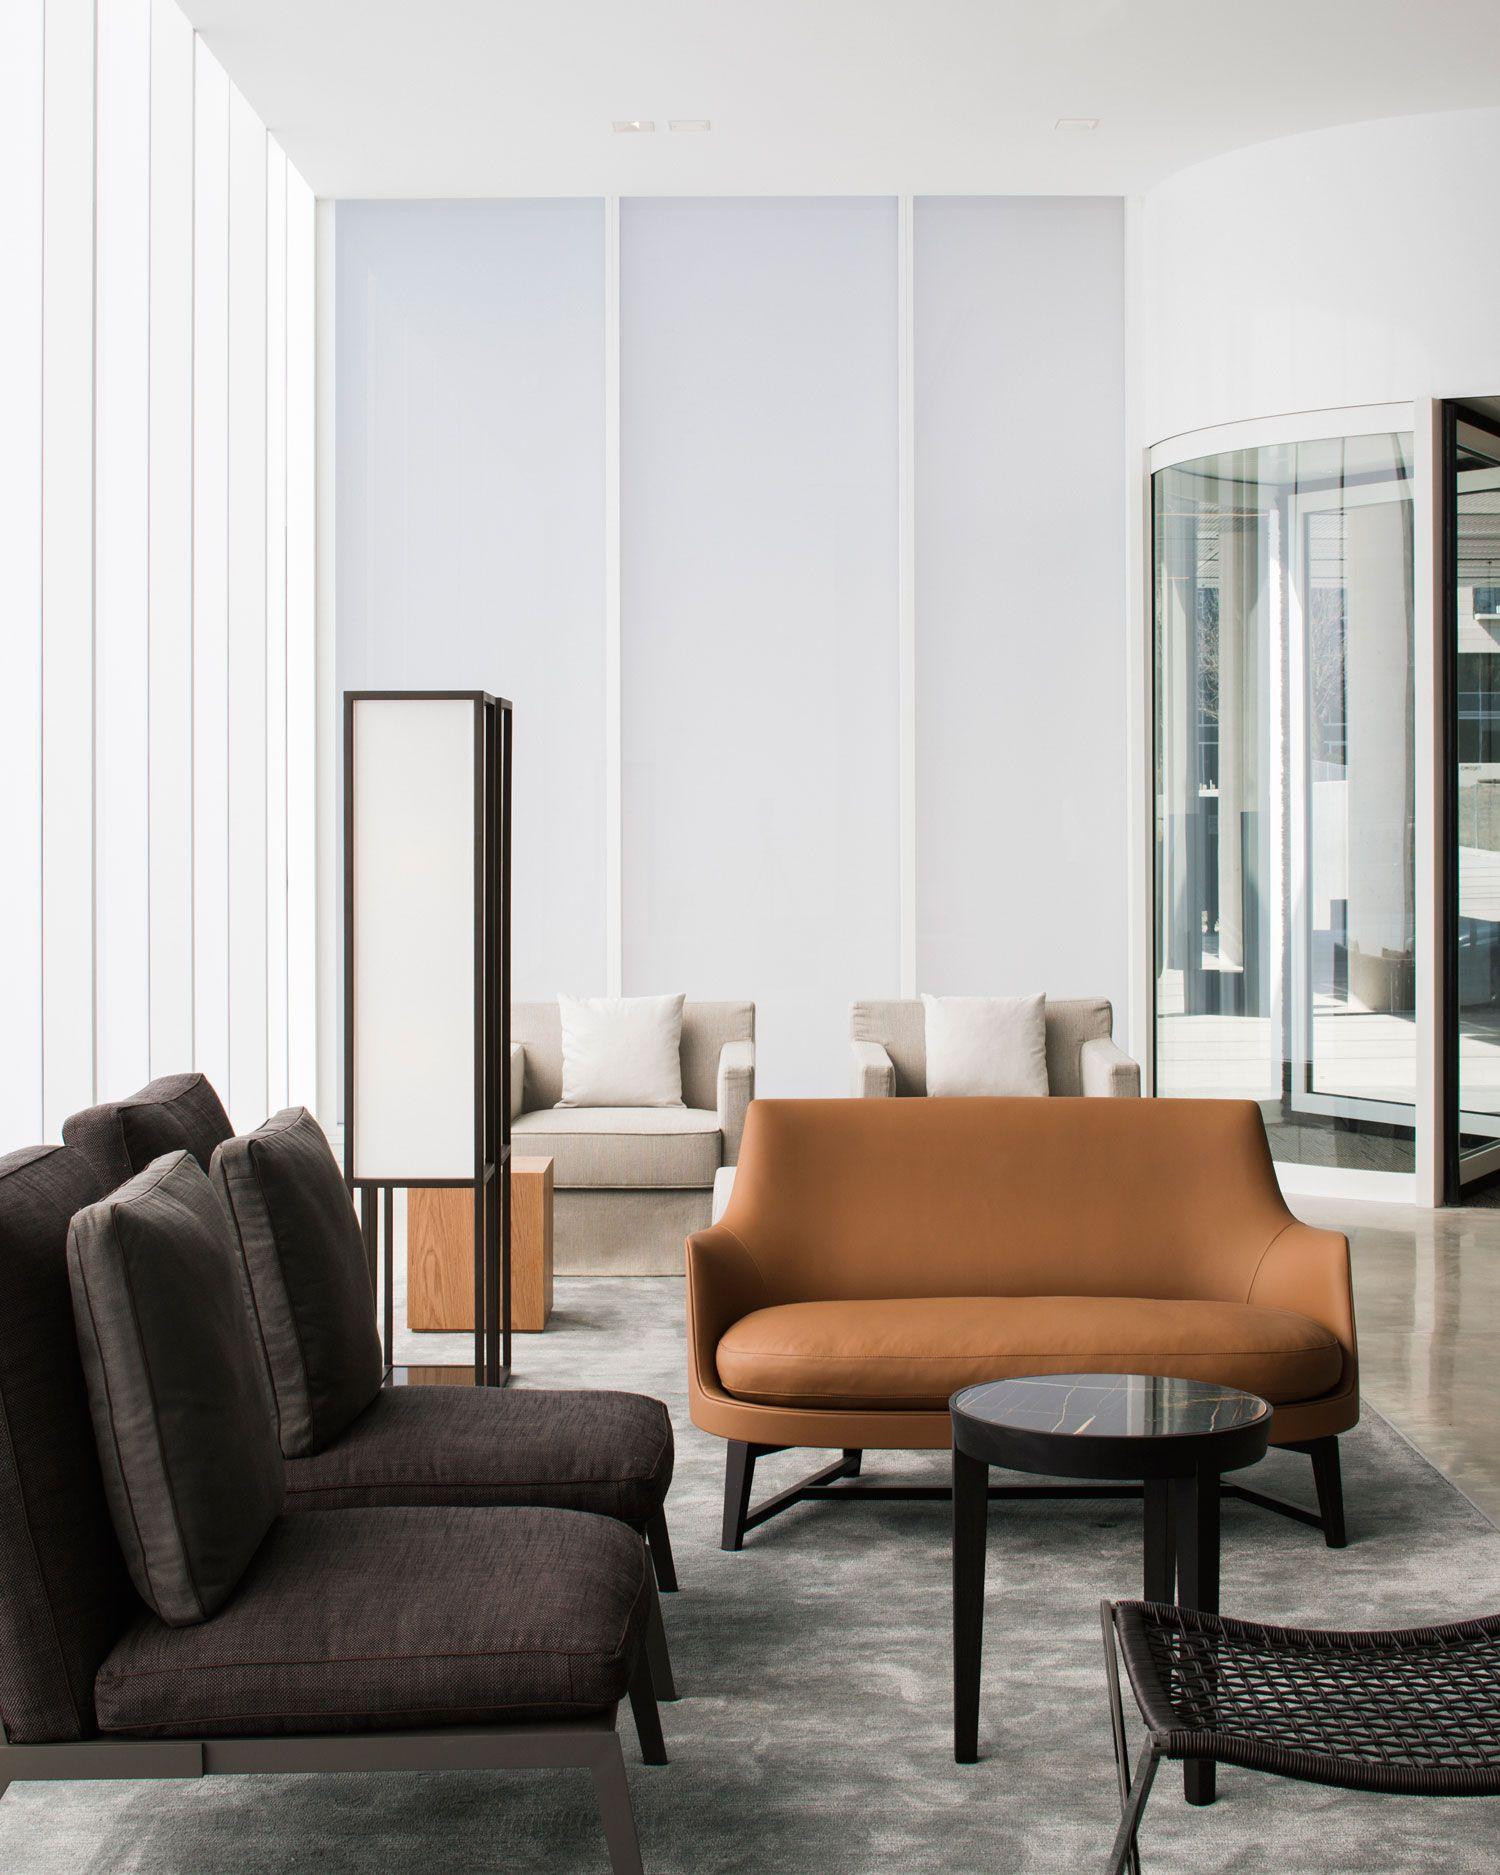 Little National Hotel Canberraredgen Mathieson Architects New Little Living Room Design Decorating Inspiration